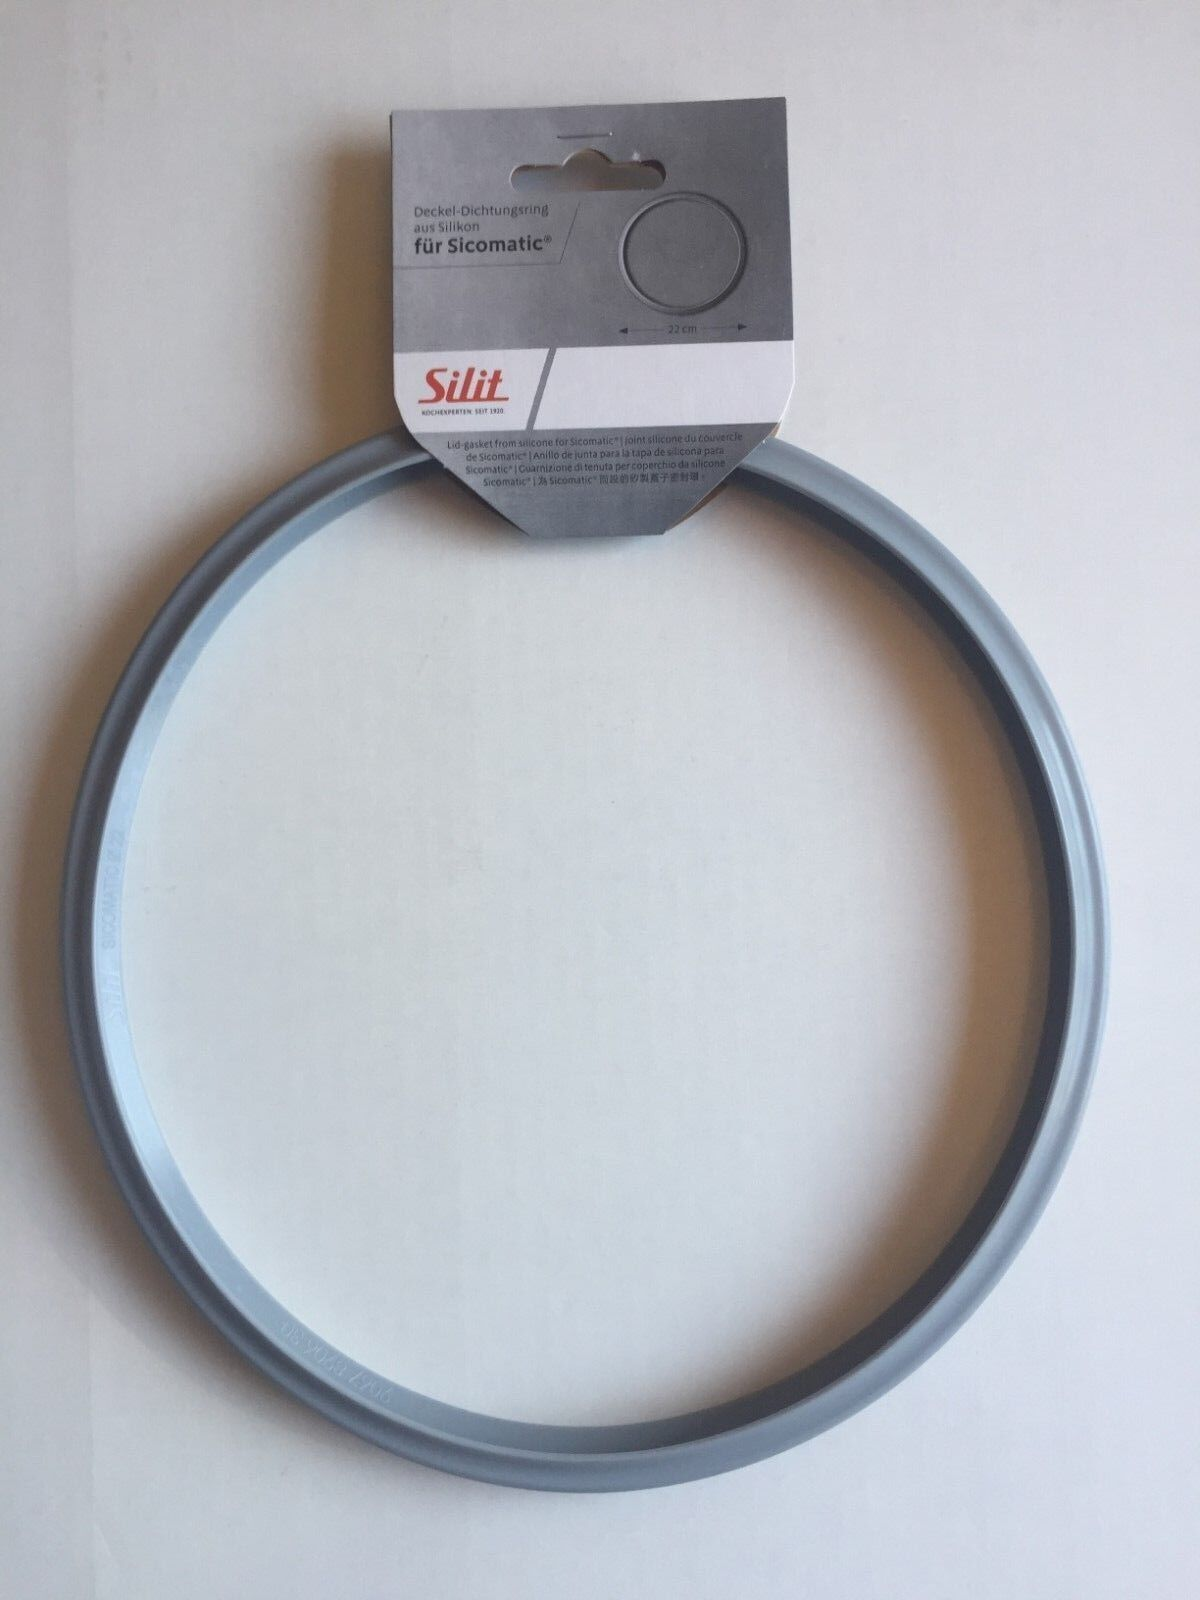 Silit Original Dichtungsring Ø 22 cm Sicomatic Schnellkochtopf - NEU - Silikon -